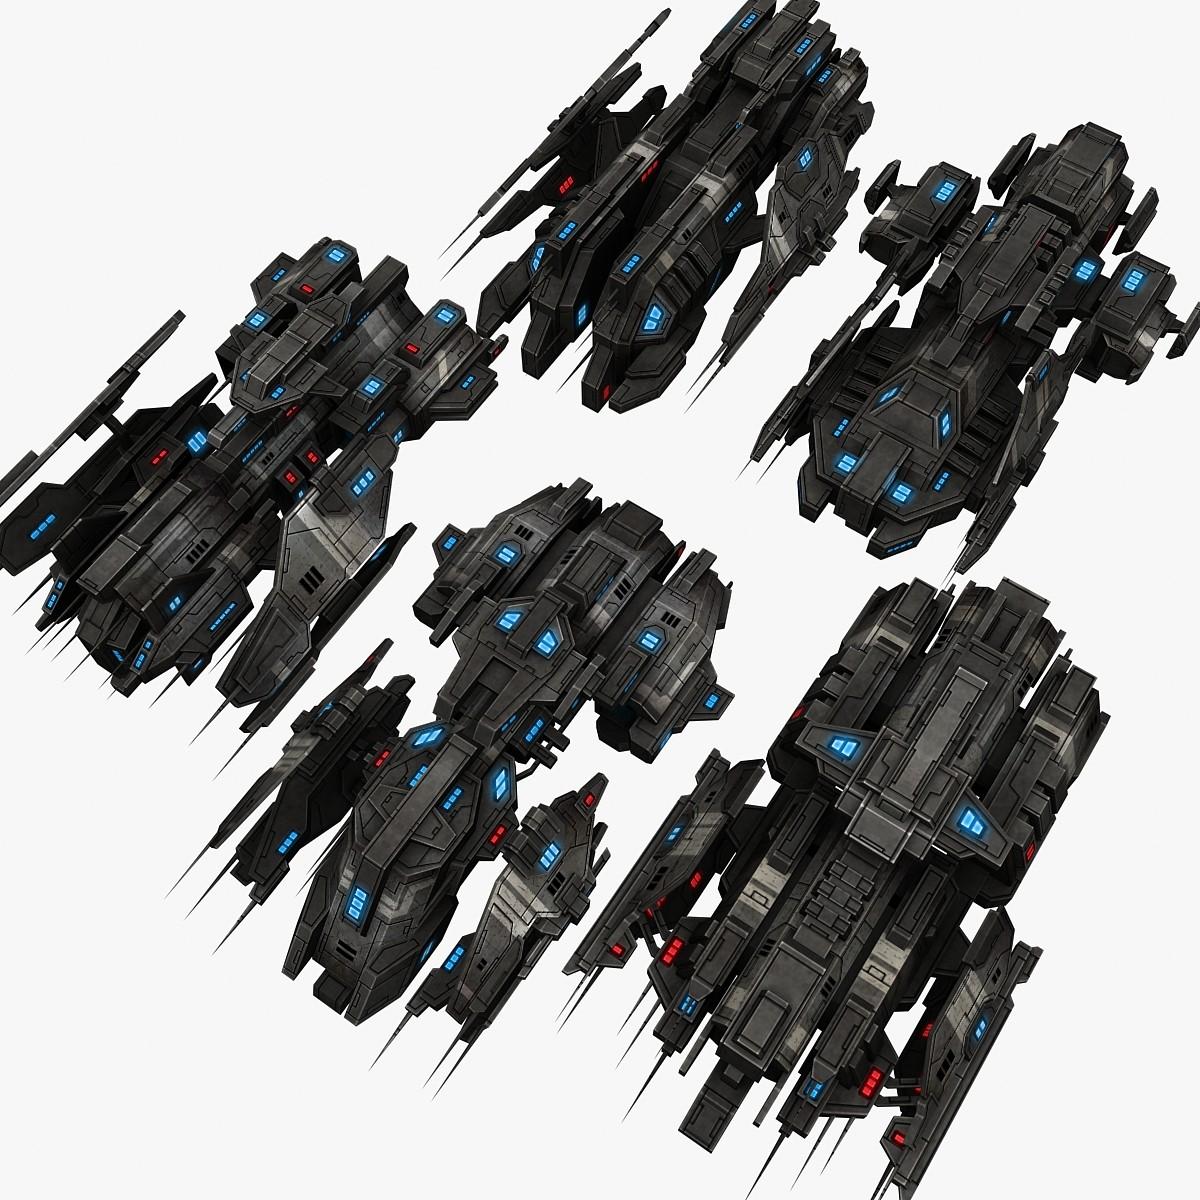 5_battleship_fighters_preview_0.jpg